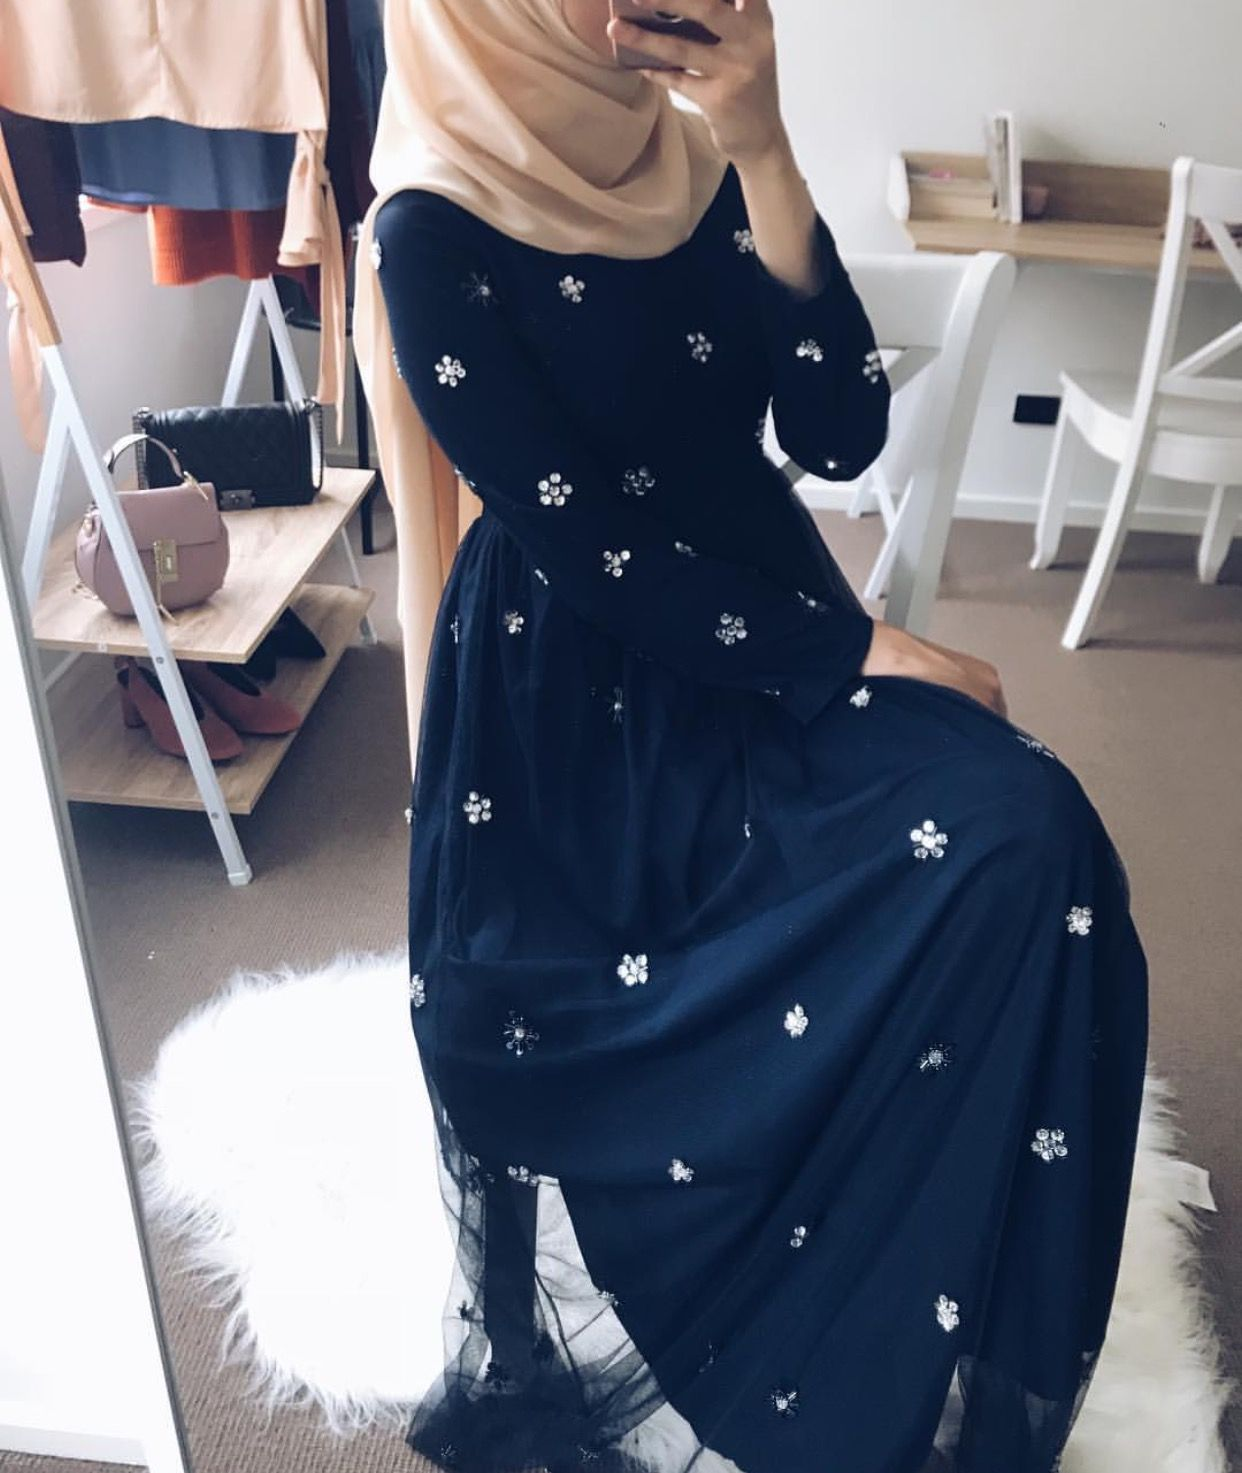 Ig Modestlifestyleblog Hijab Fashion Islamic Clothing Hijab Outfit